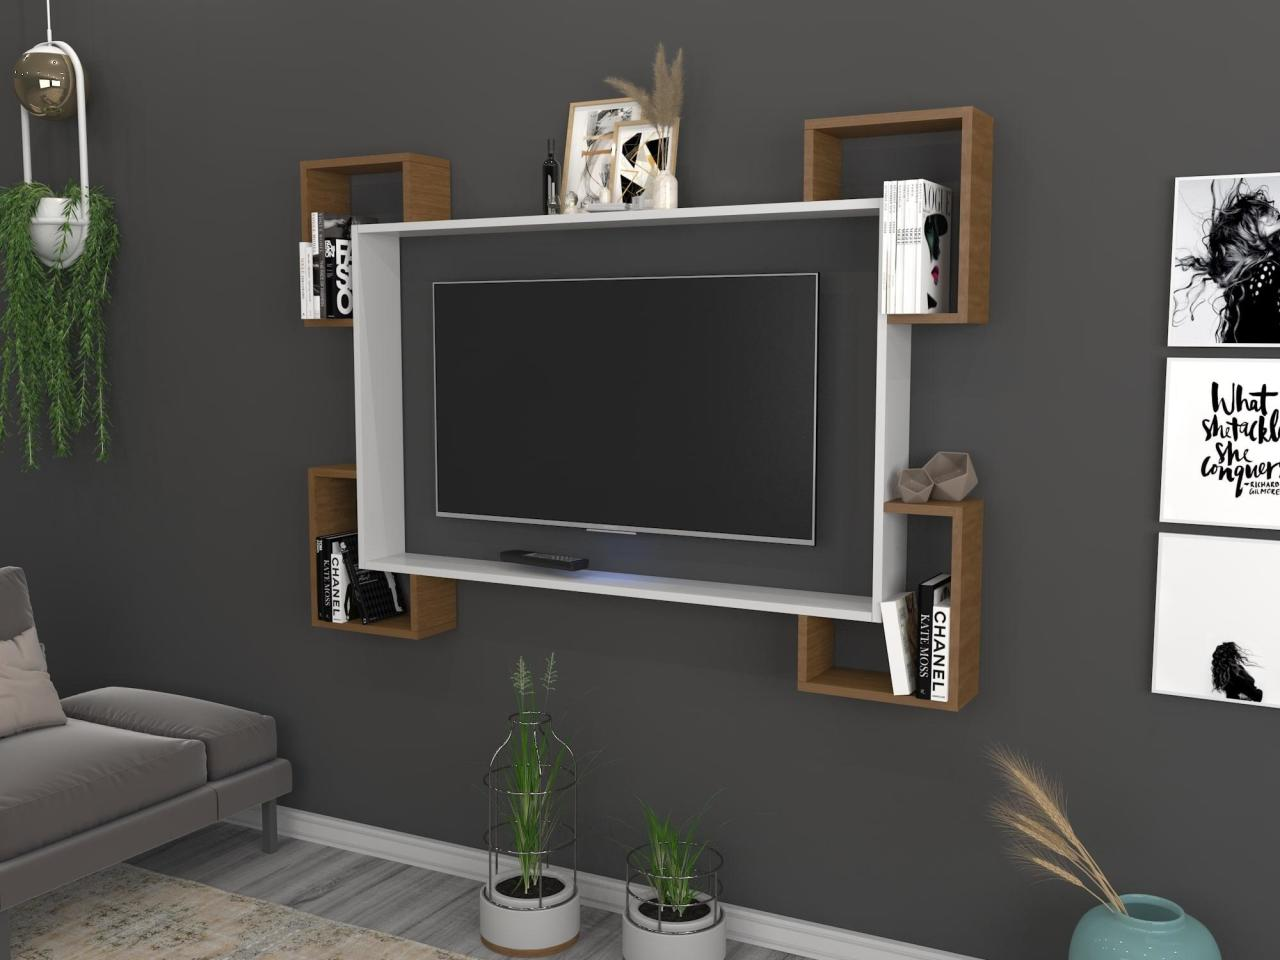 Home Furniture Tv Furniture TV Table TV Cabinet Wall TV Unit Trendsetter Bookcase Shelf Wall Tv Unit White Walnut